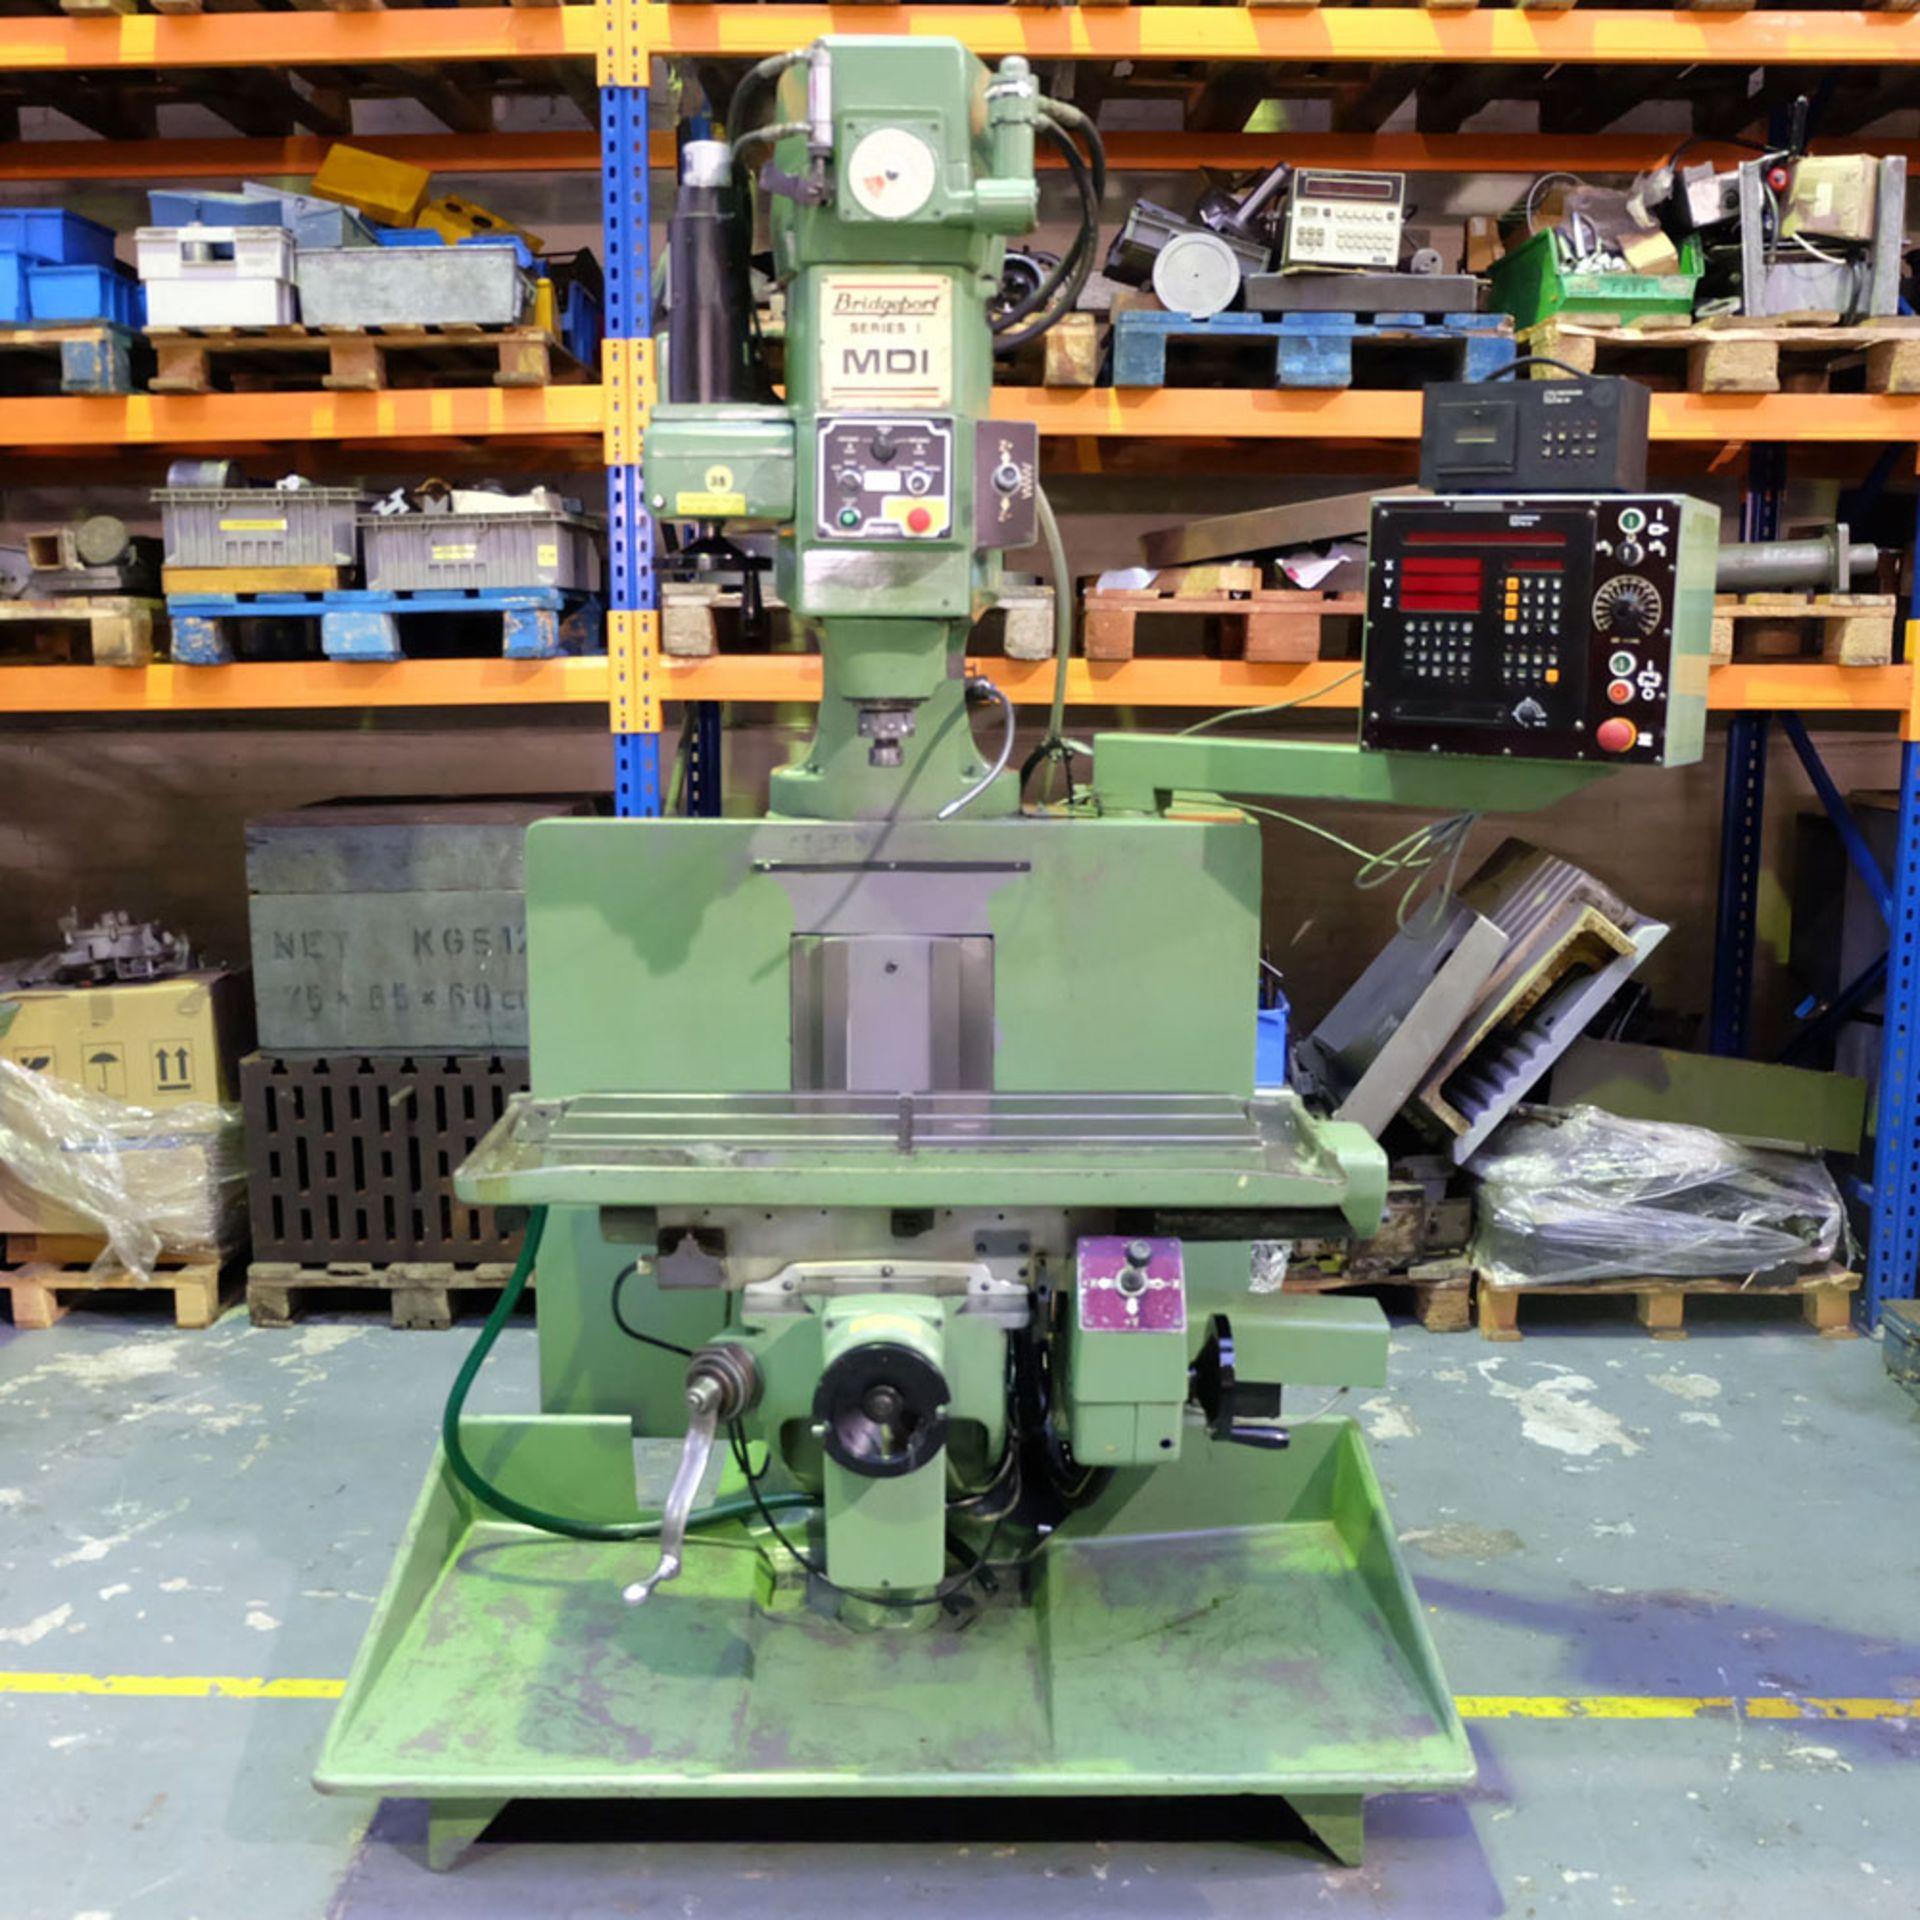 Bridgeport Series 1 MDI. CNC Mill with Heidenhain TNC131 3 Axis Control. - Image 3 of 14